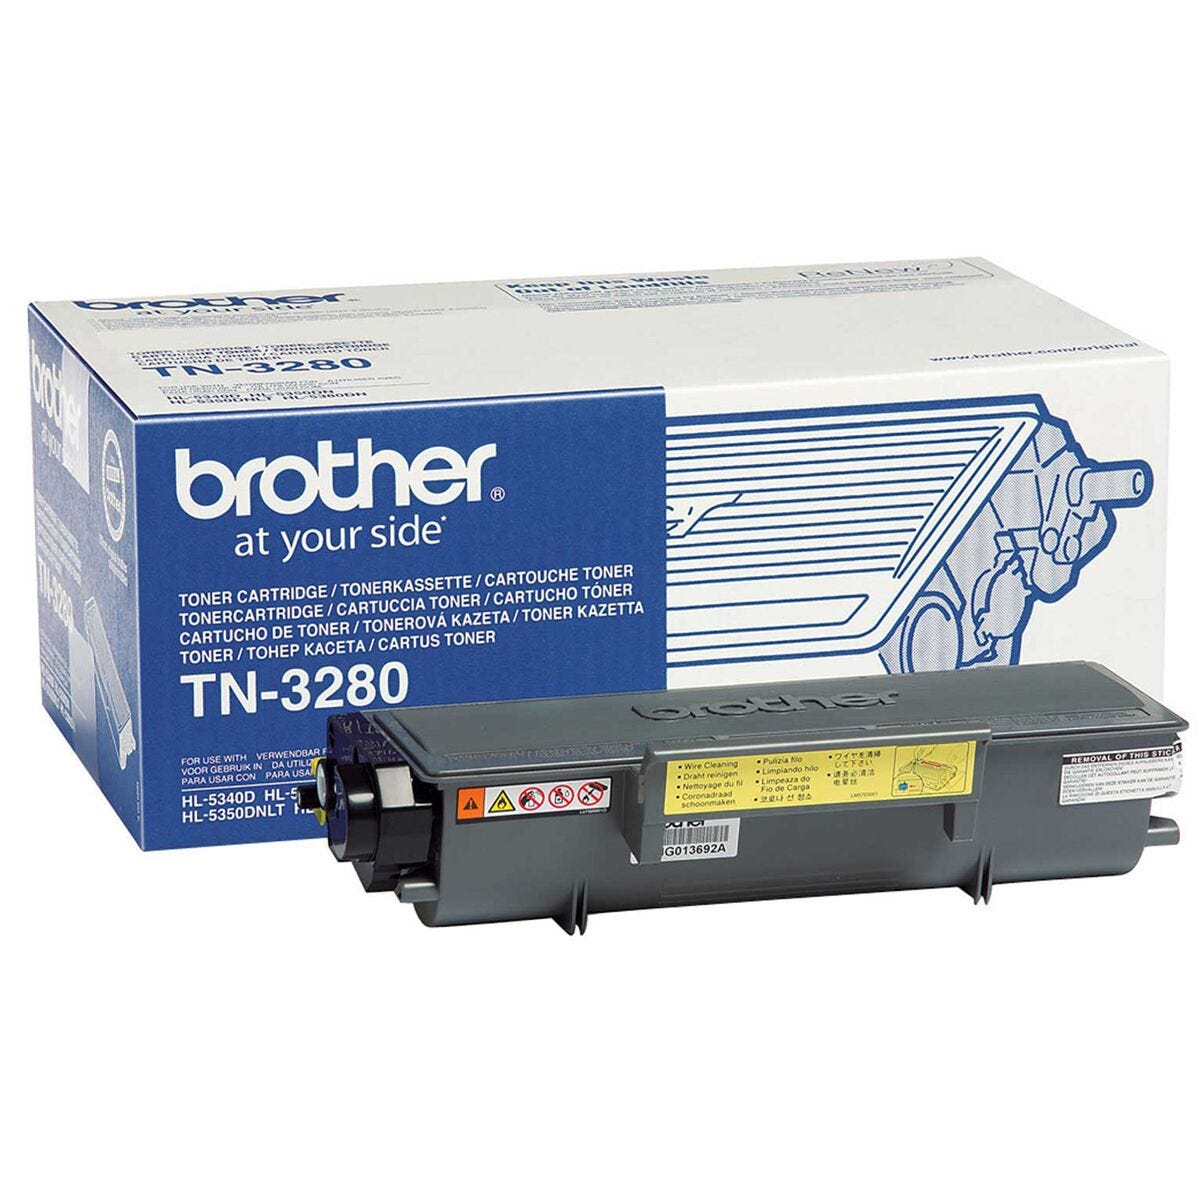 Brother TN3280 Mono Printer Ink Toner Cartridge